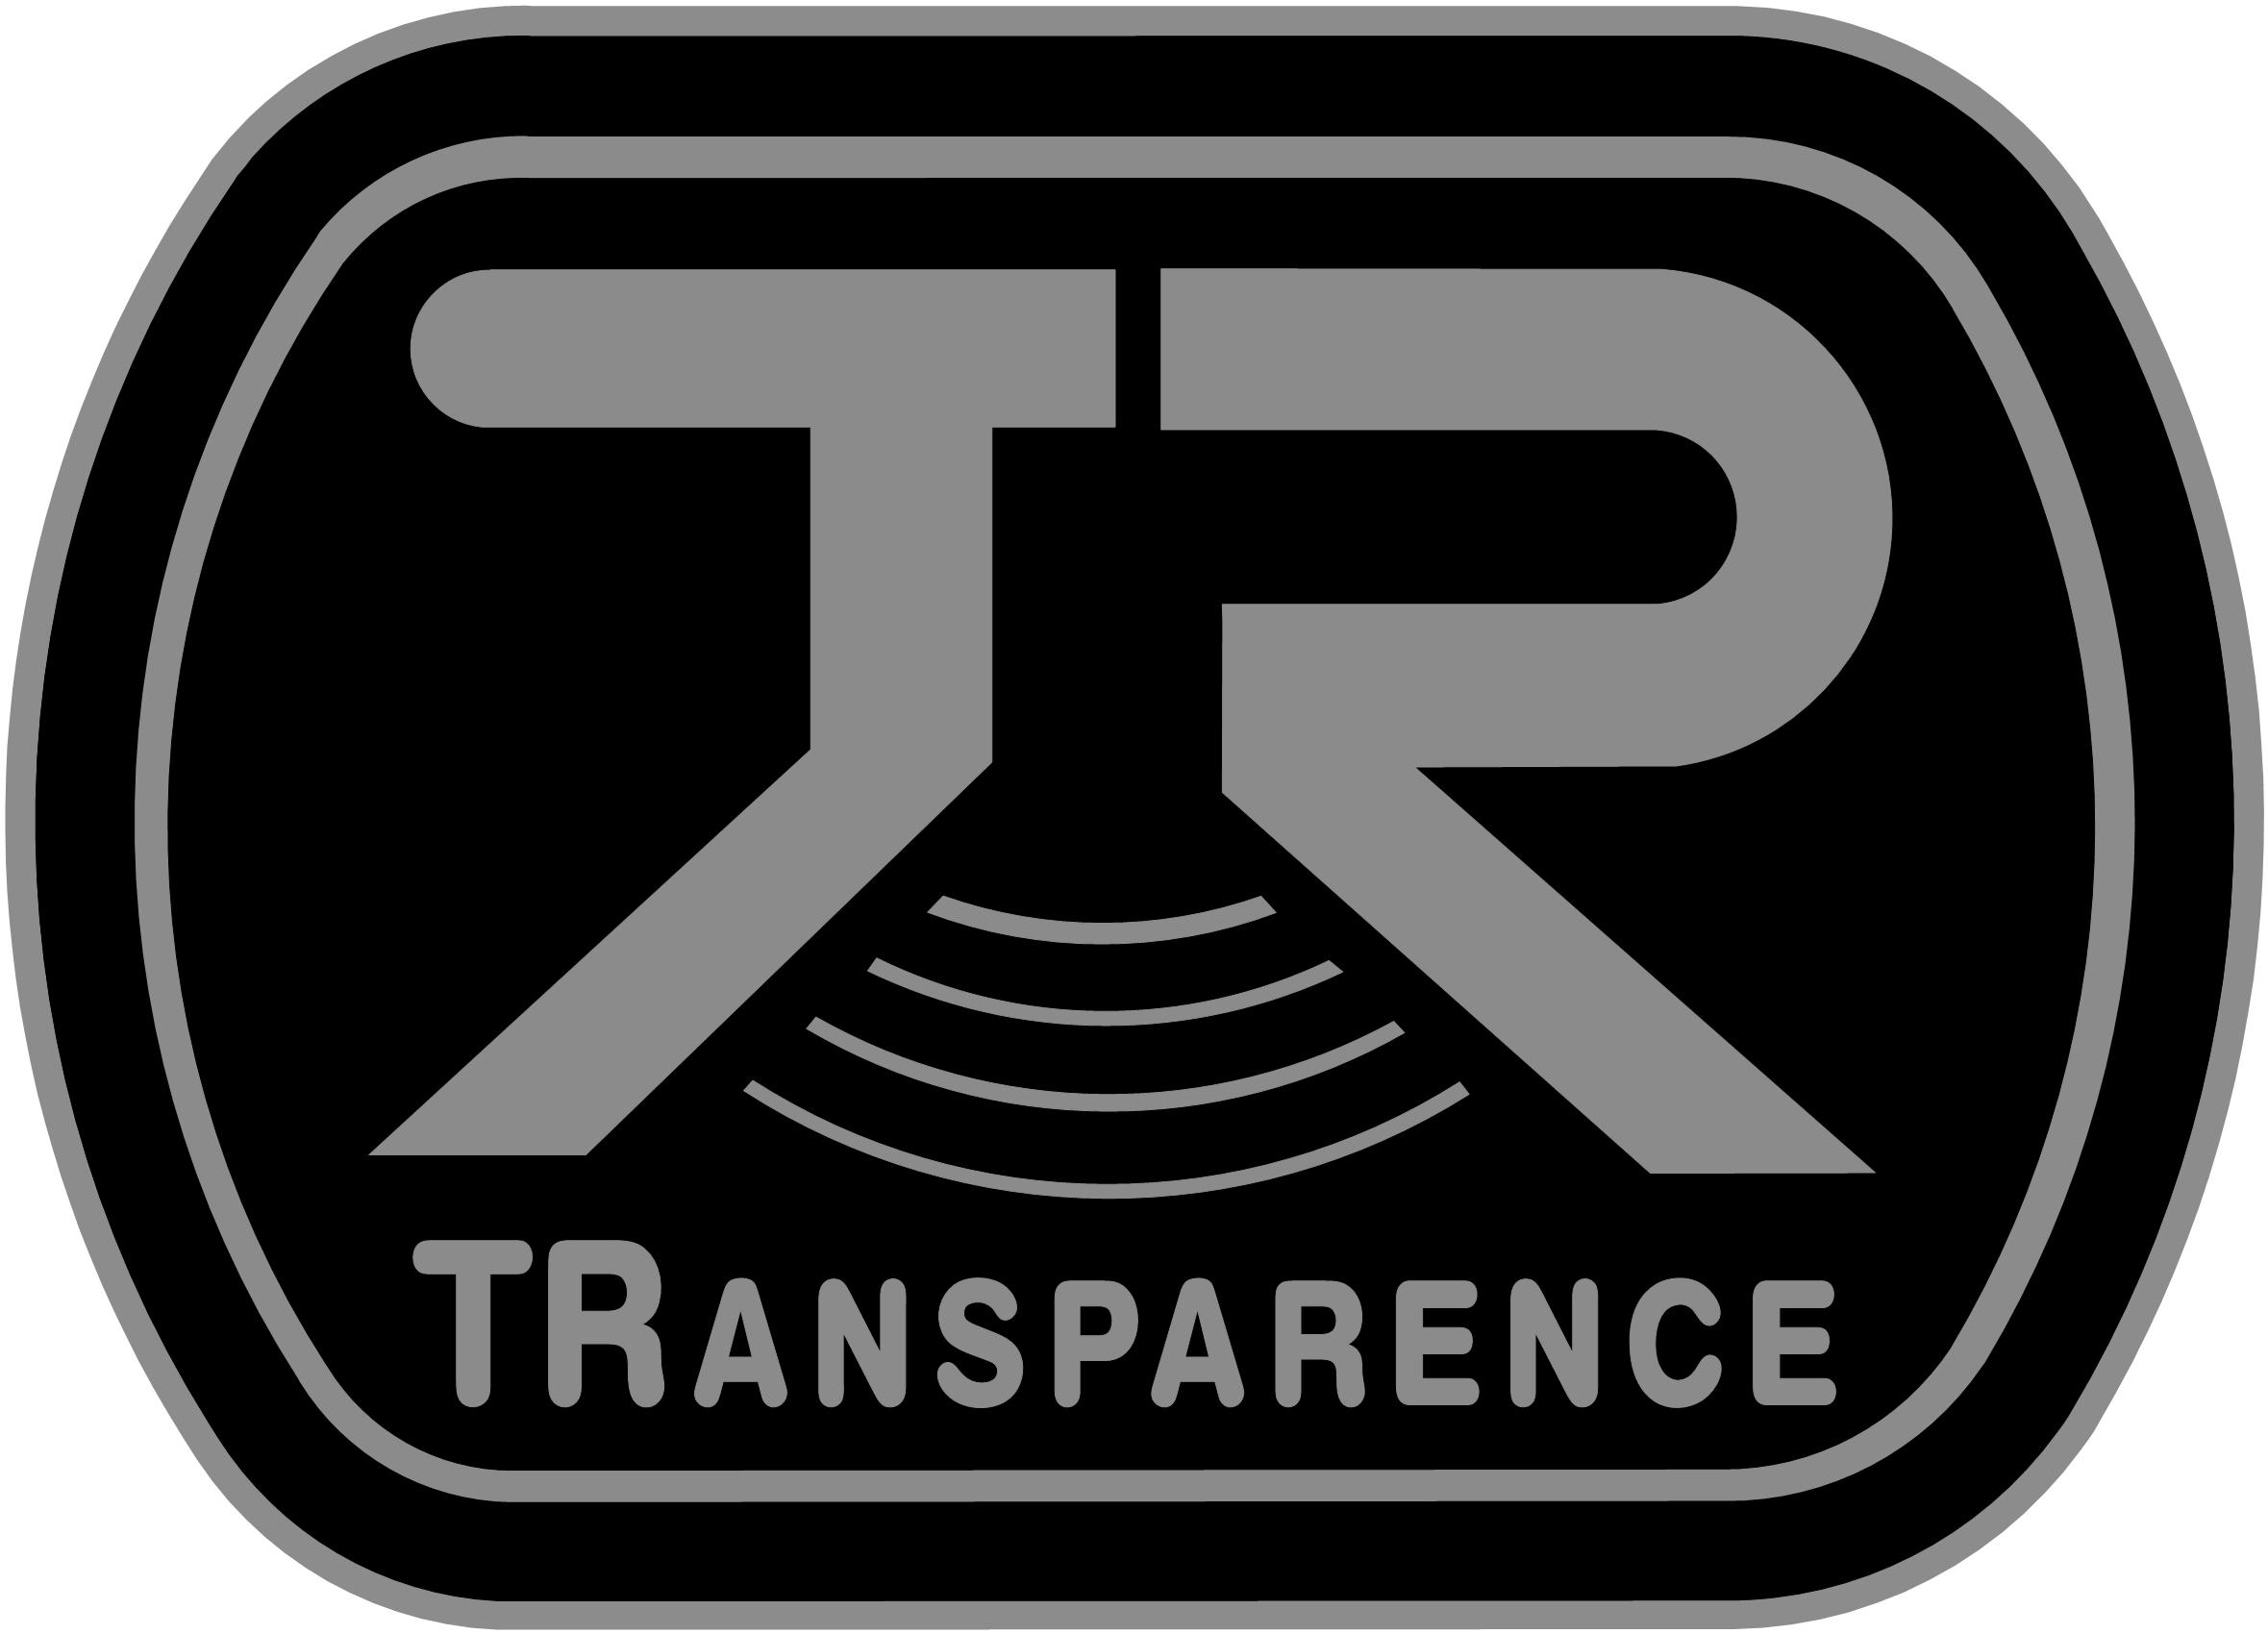 Transparence logo